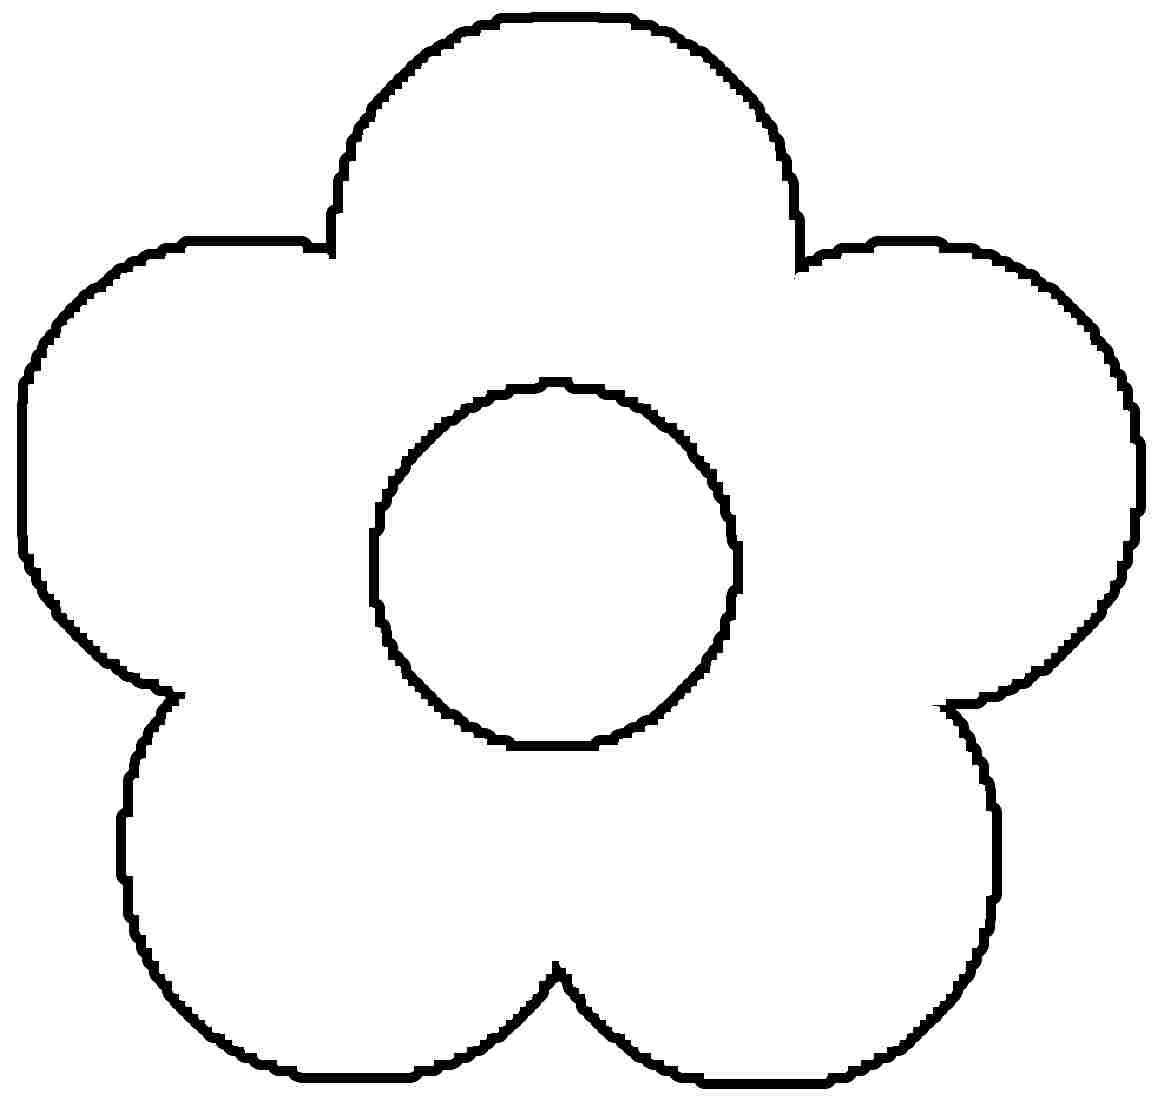 free printable preschool flower coloring pages very simple flower coloring page for preschool simple flower pages free preschool coloring printable